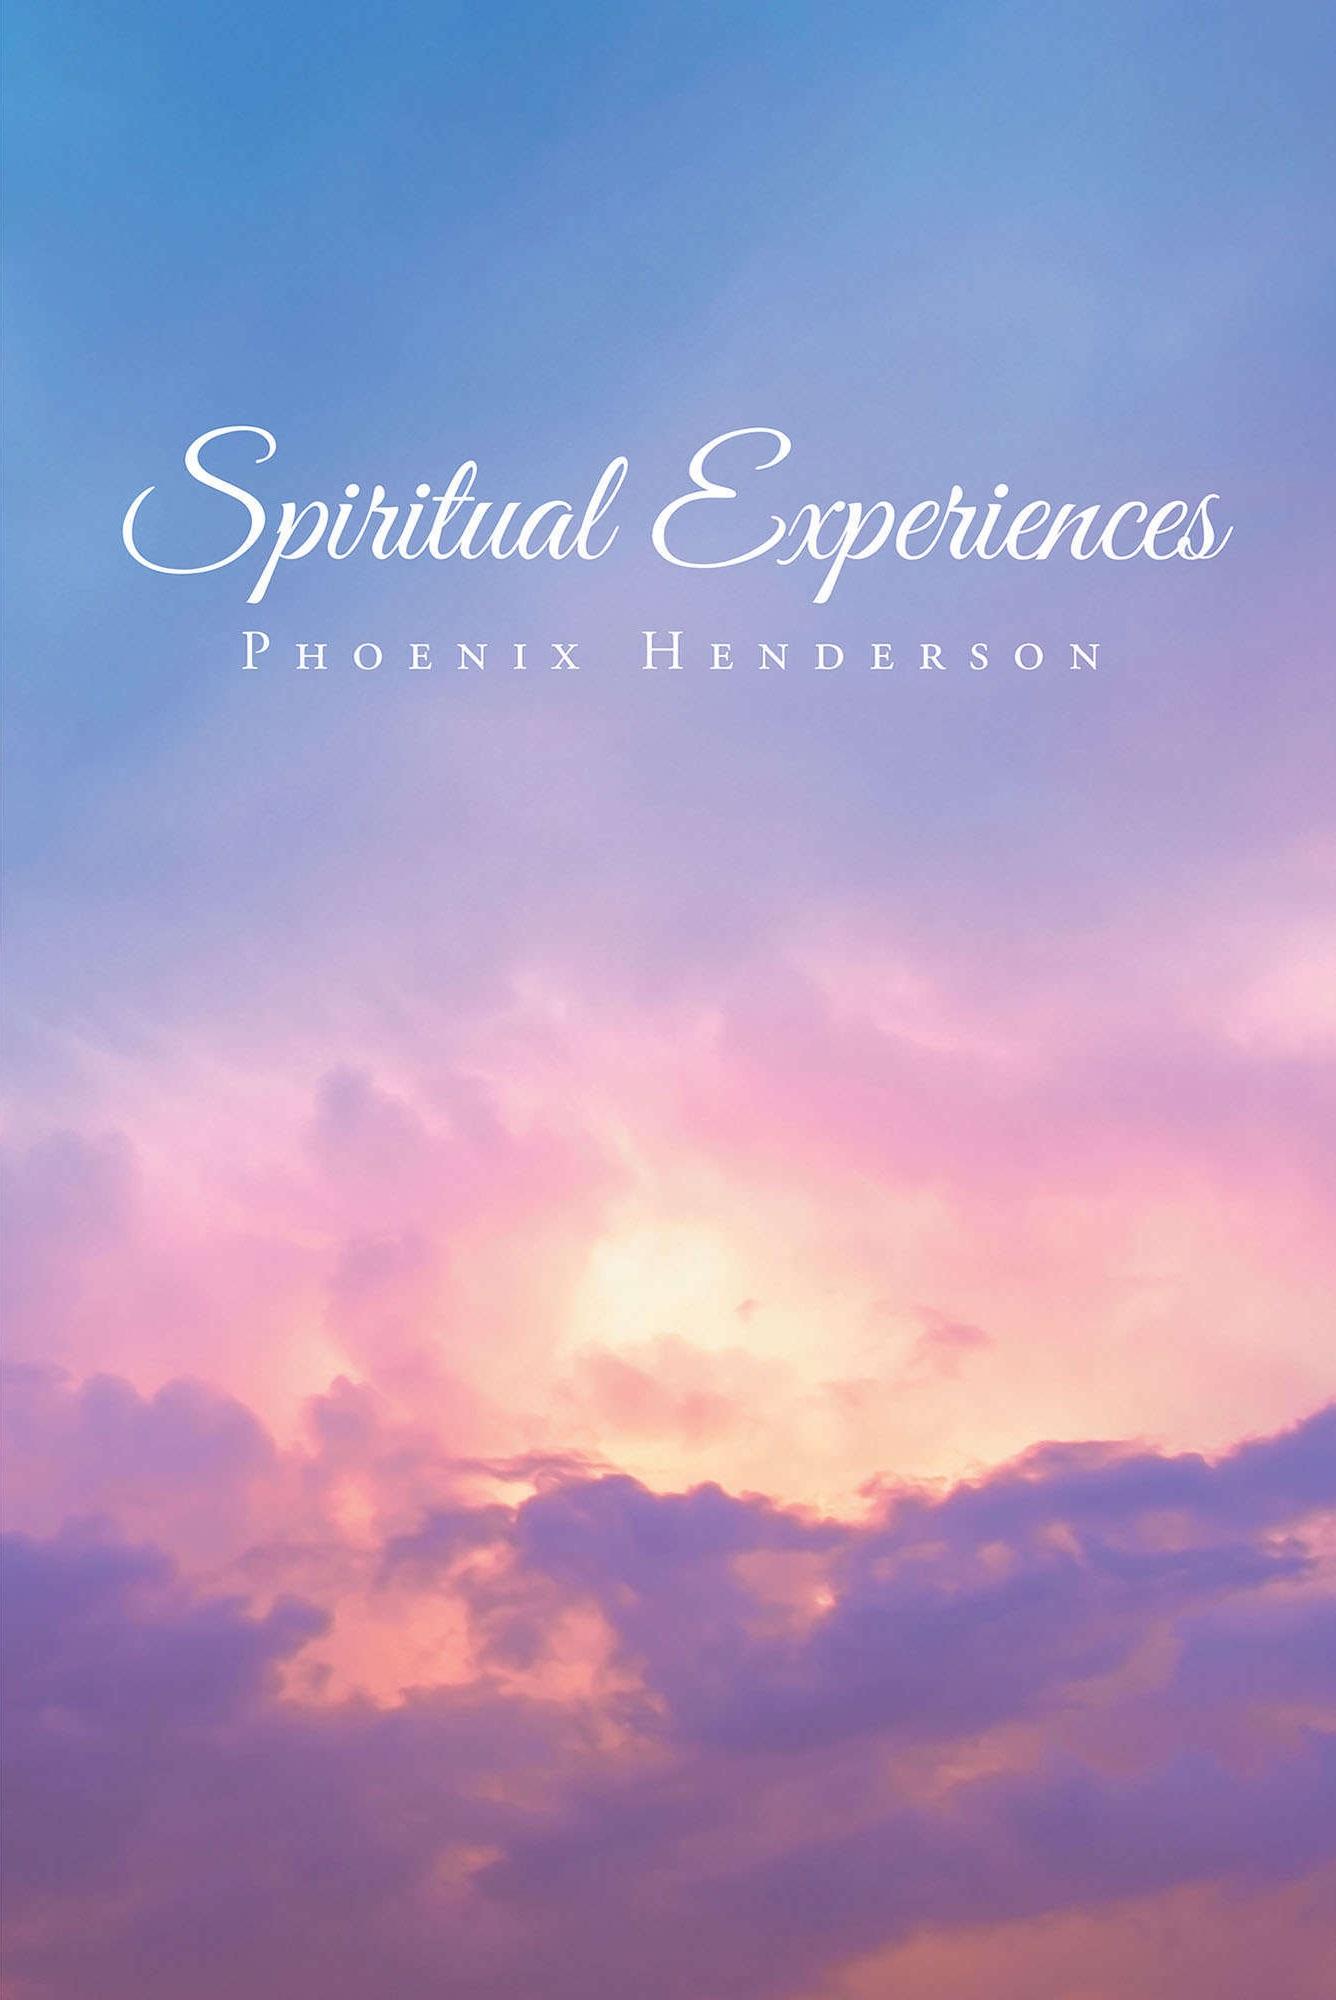 SPIRITUAL EXPERIENCES